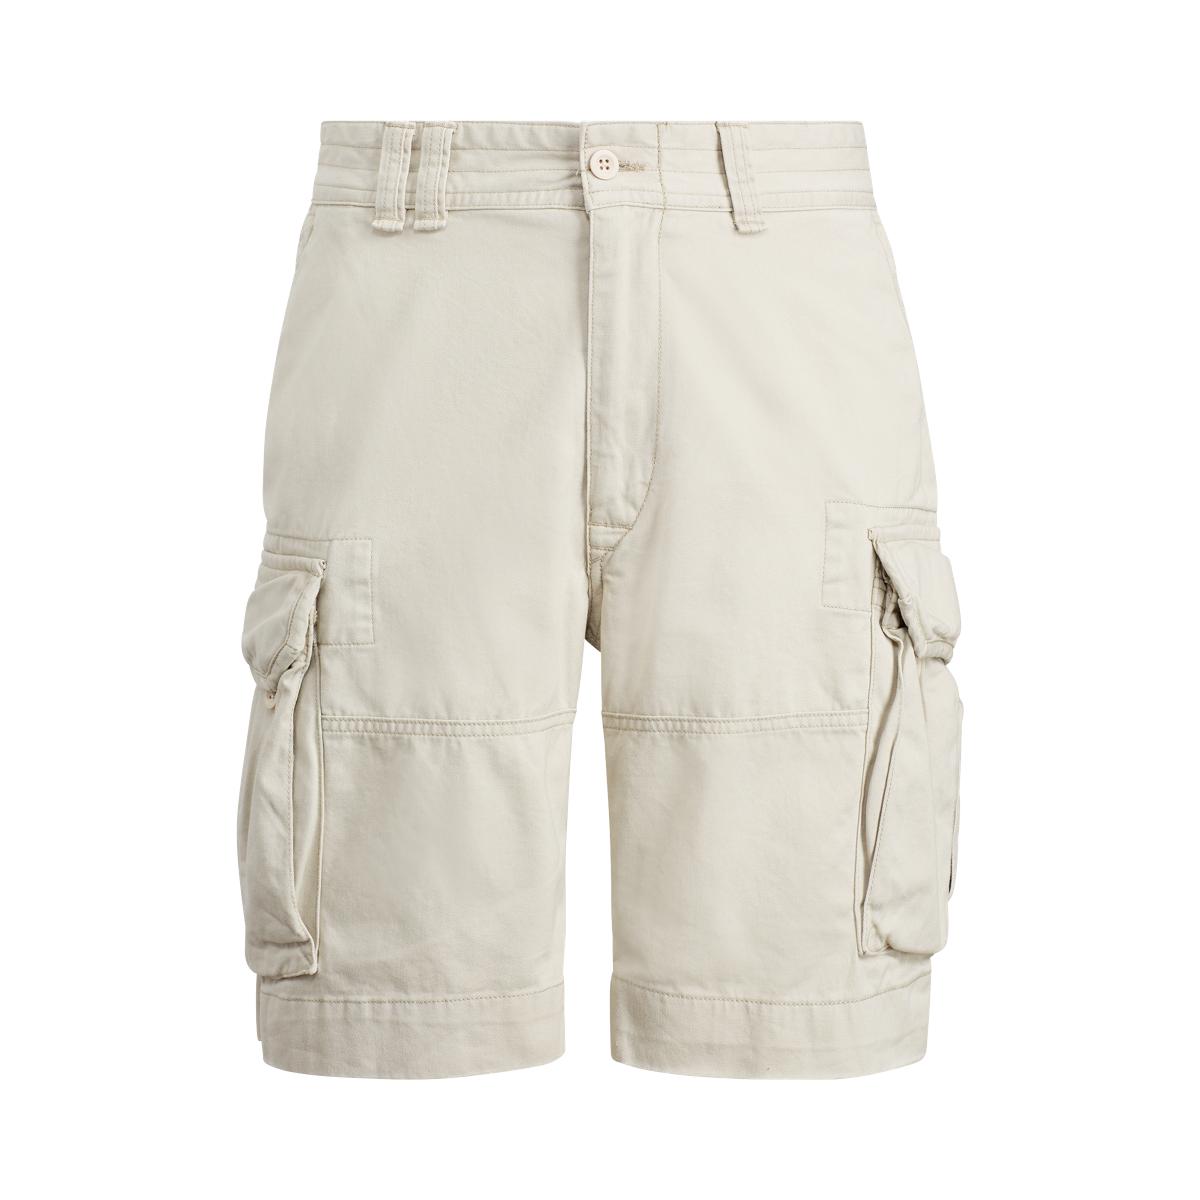 69023f360 Classic Fit Cotton Cargo Short